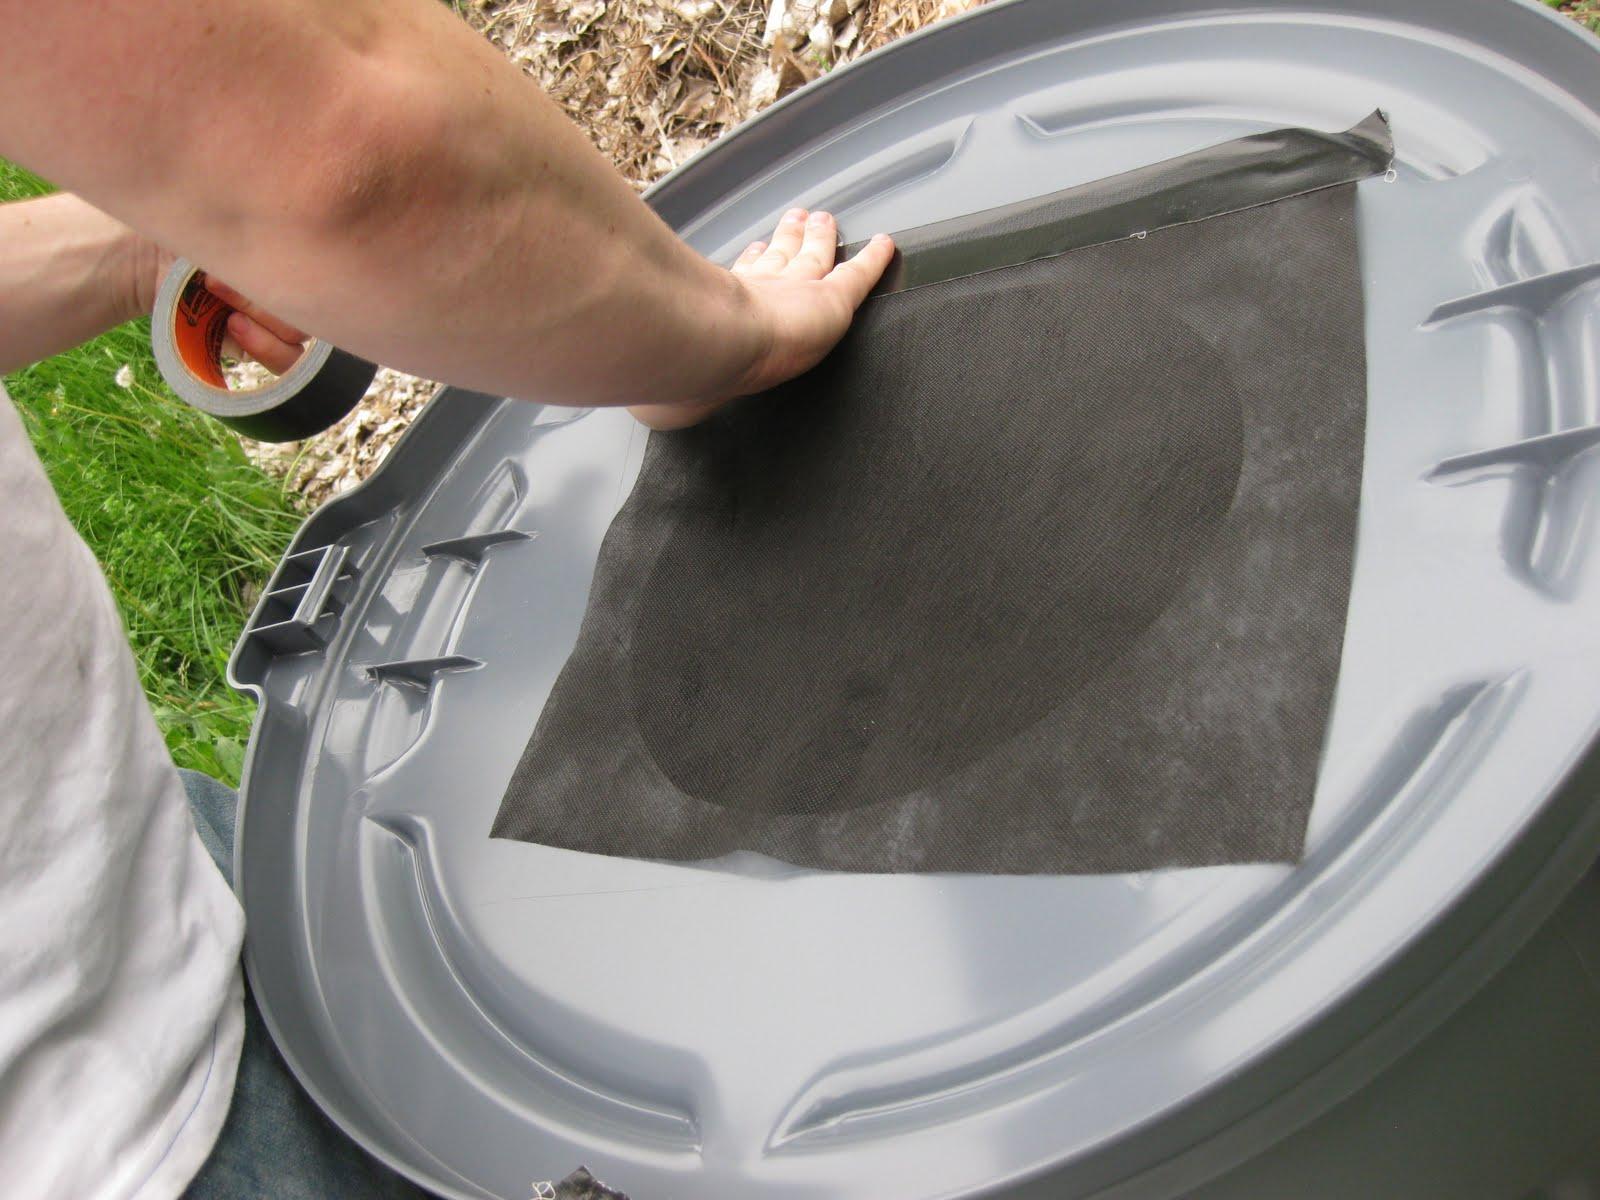 how to put down gunpowder barrels